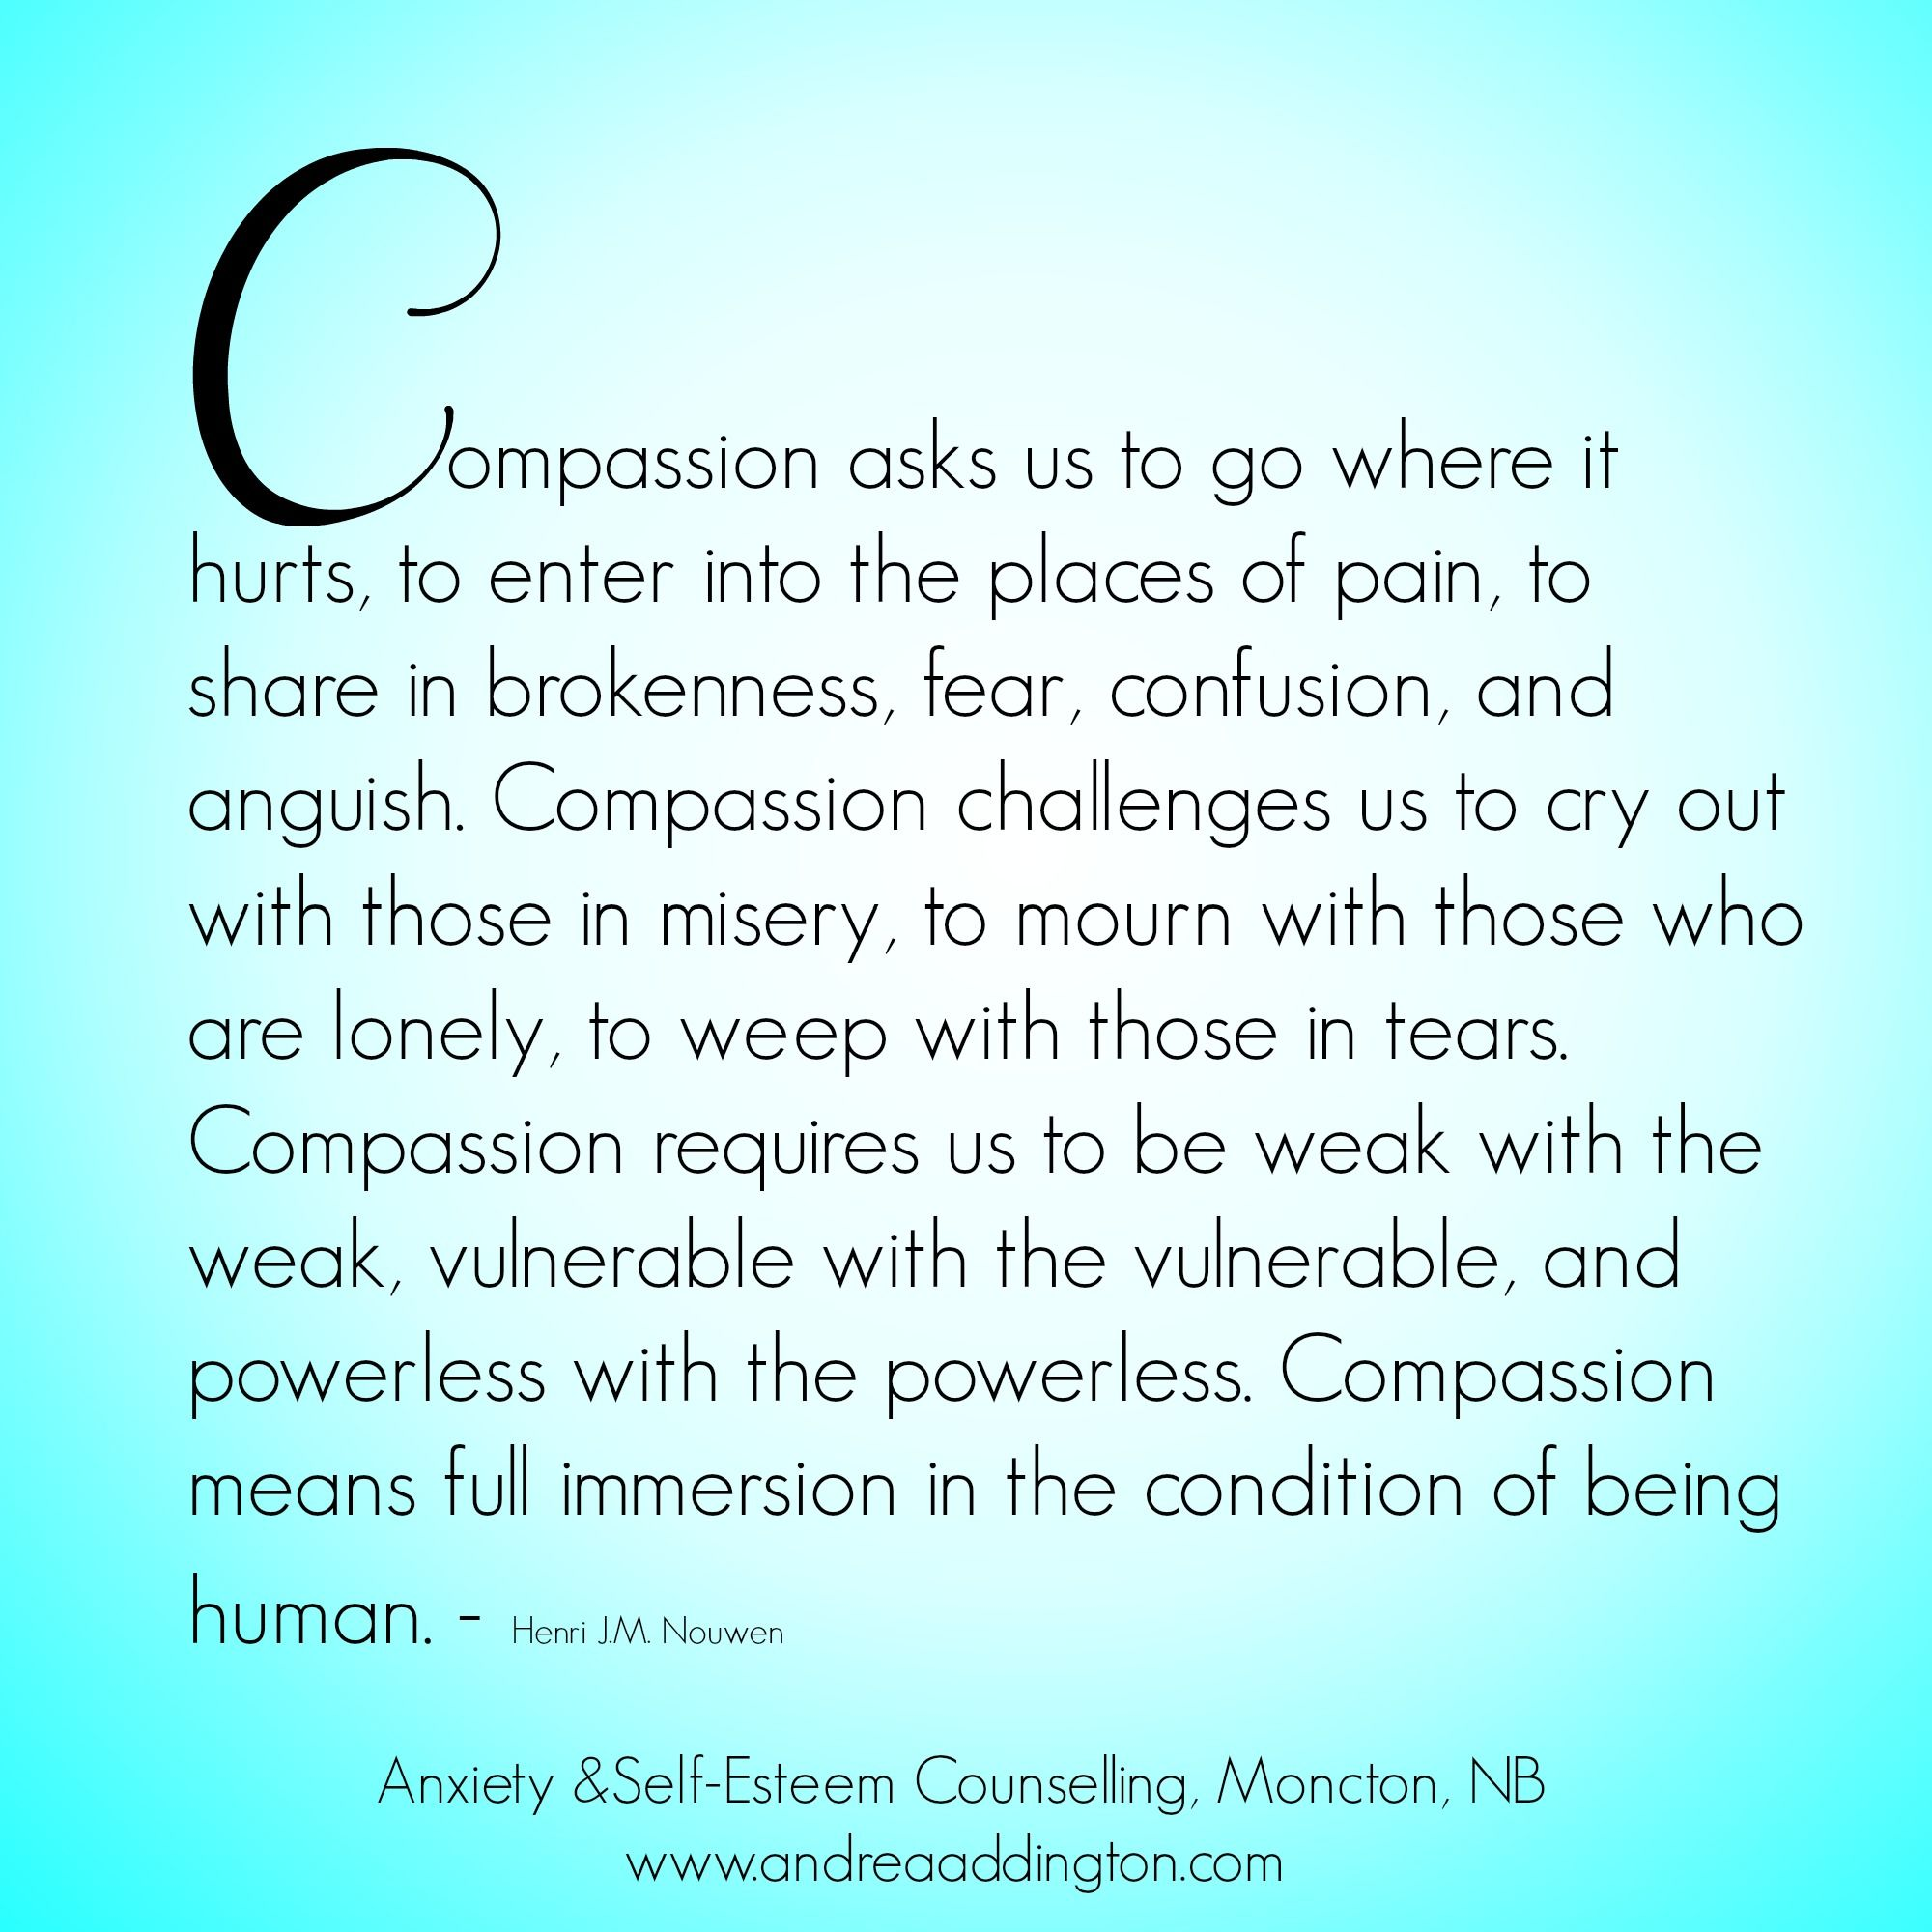 Compassion Henri J.M. Nouwen quote | Hero quotes ...